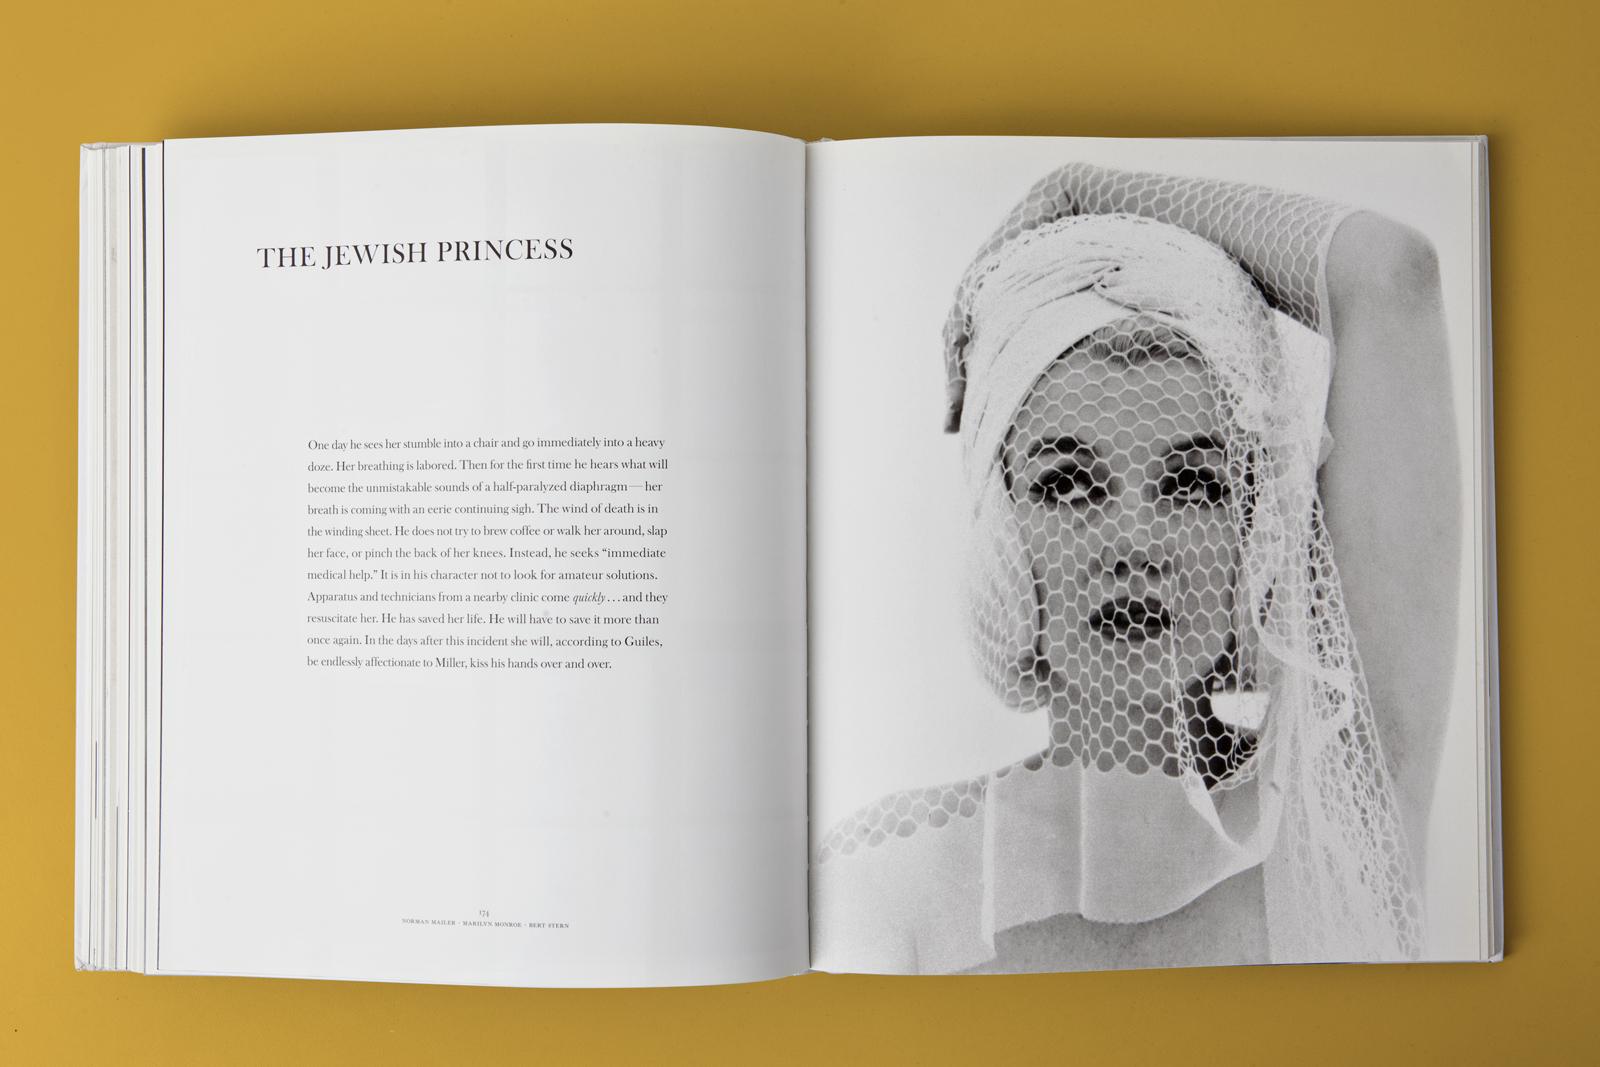 Marilyn Monroe by Norman Mailer - Bert Stern 11